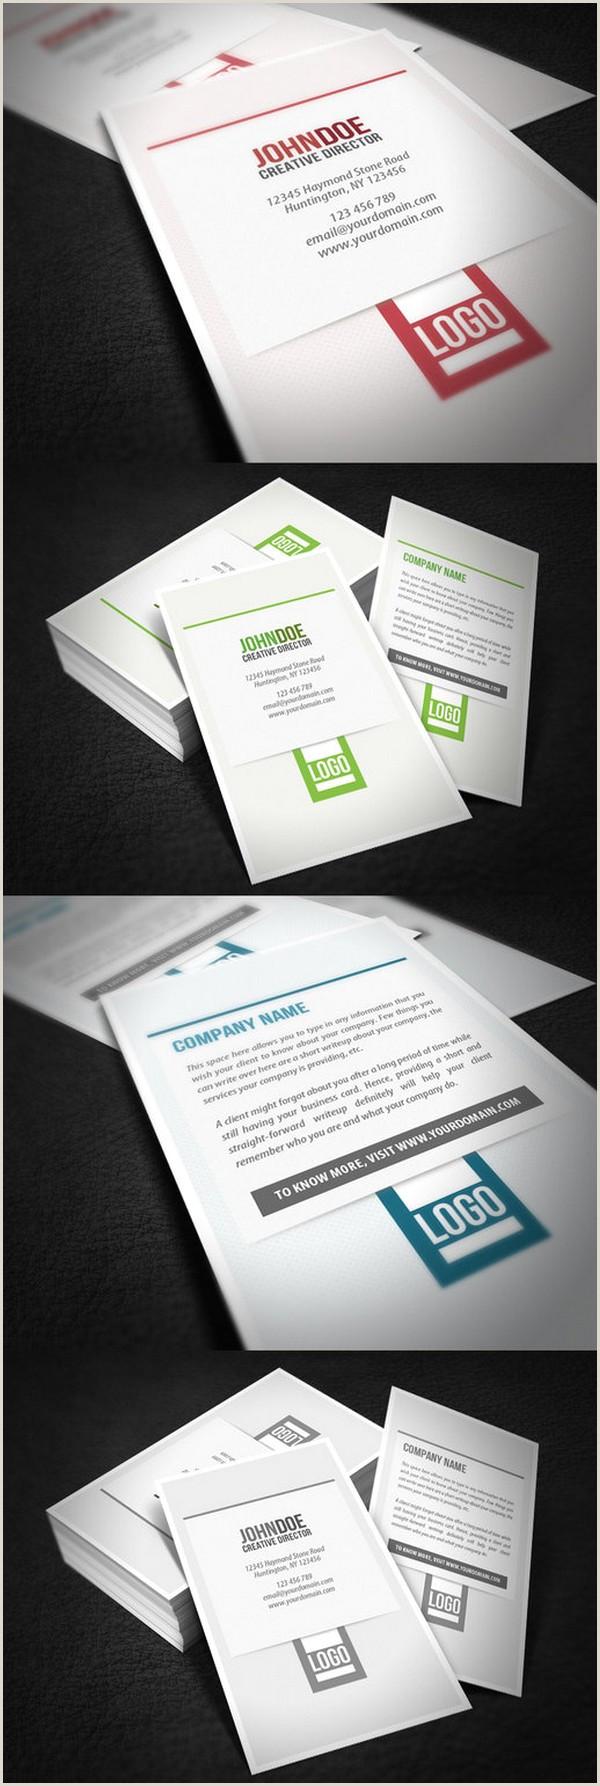 Unique Style Business Cards 50 Unique Business Cards – Drawing Inspiration